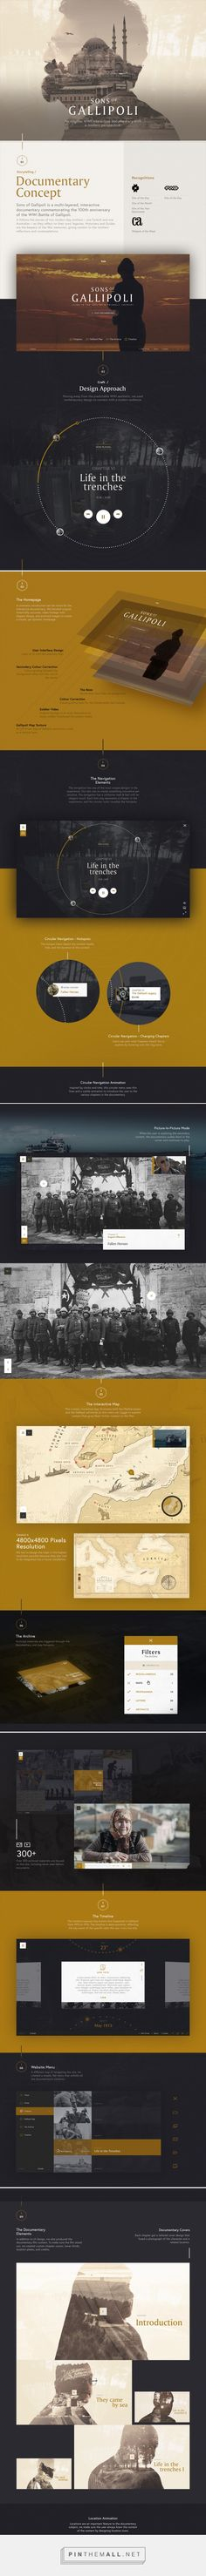 Sons of Gallipoli: Interactive Documentary on Behance